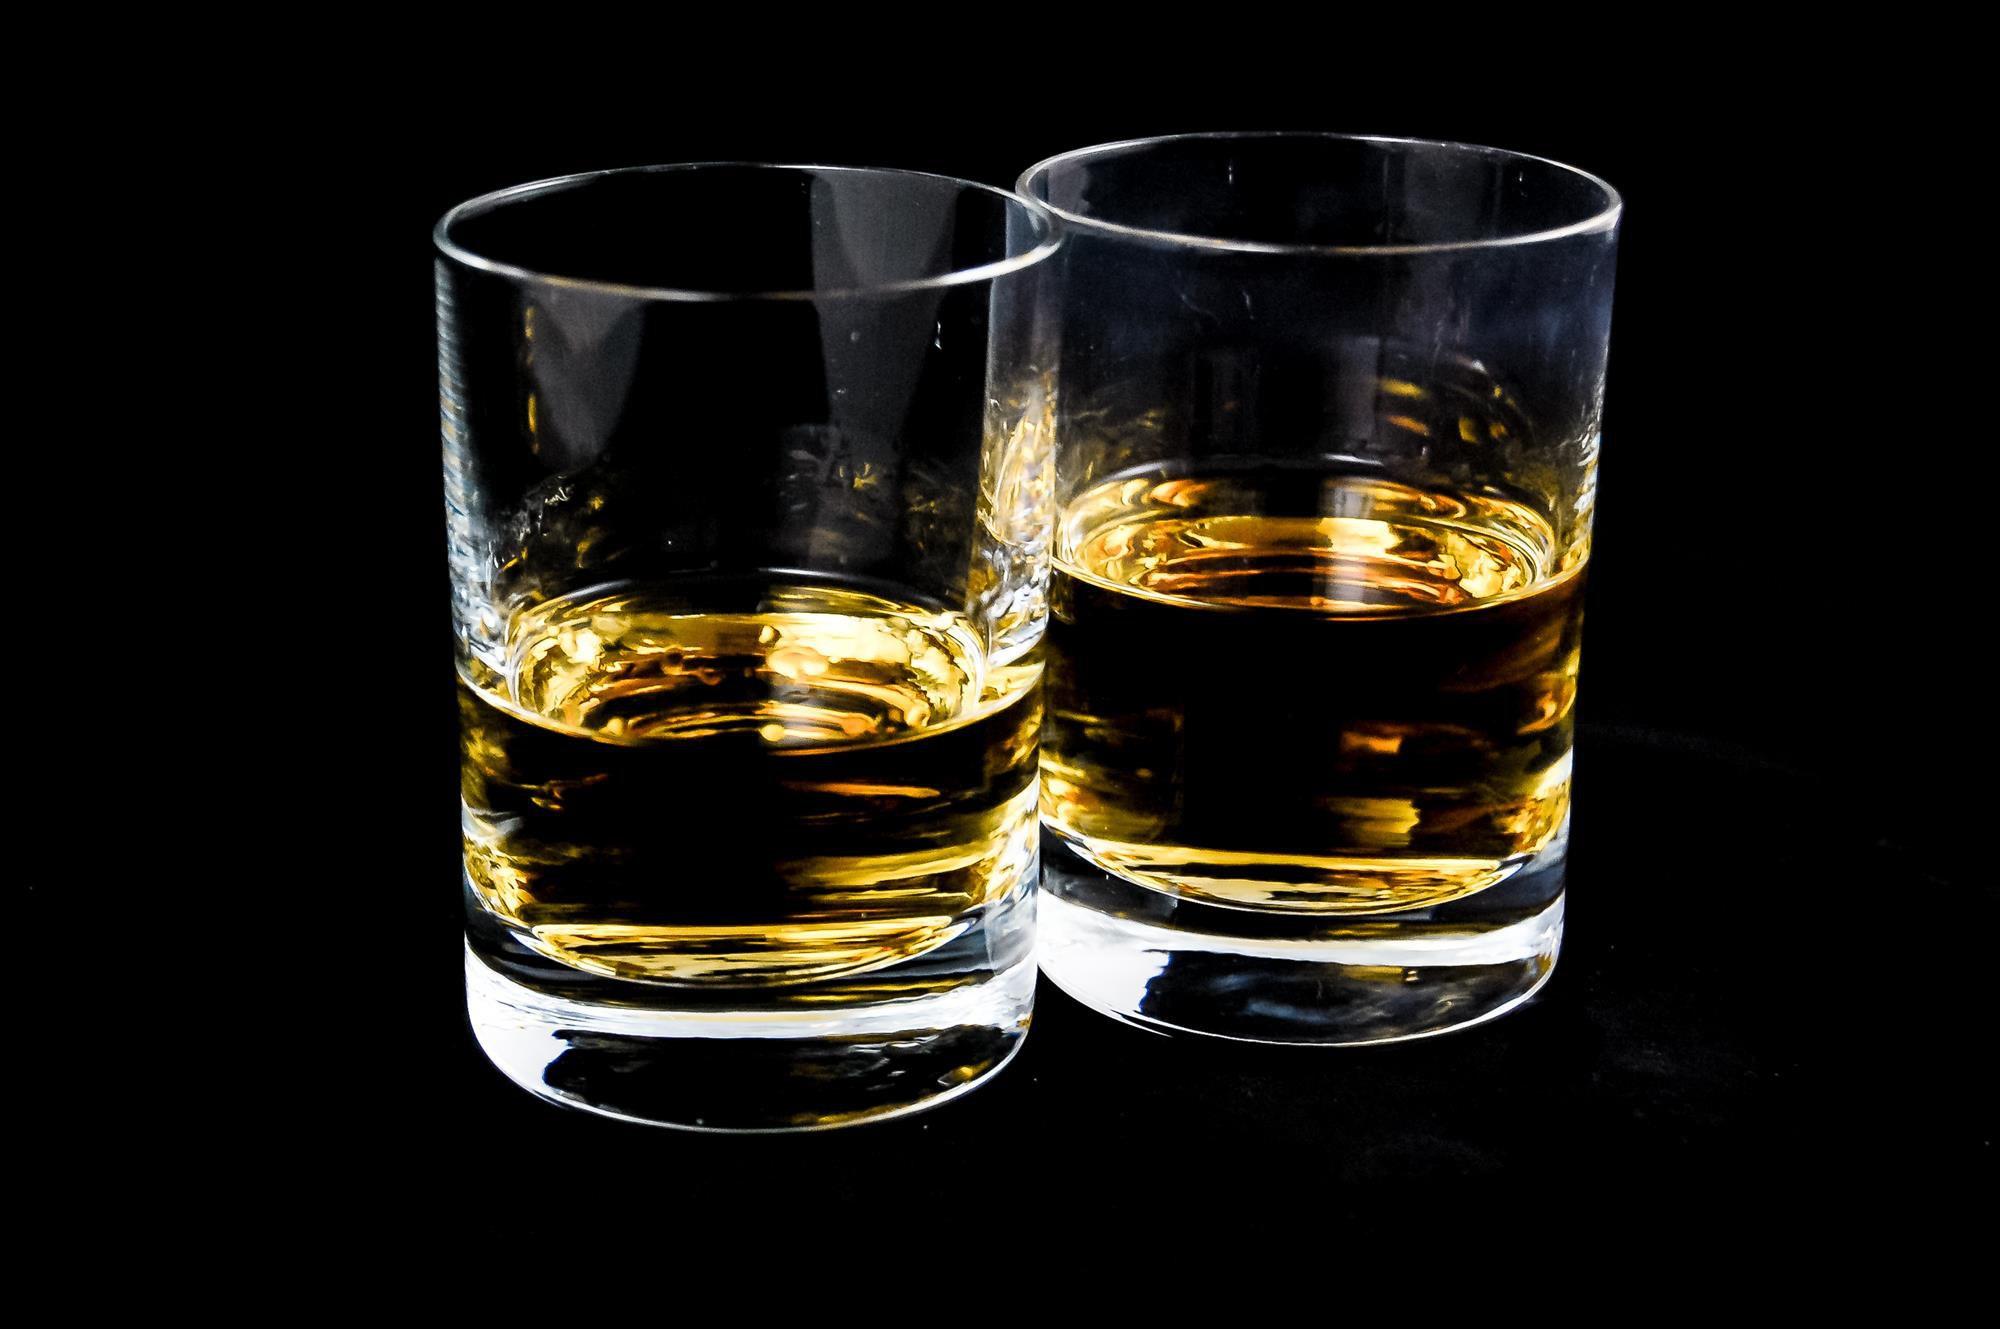 Alcoholic Beverages - Global Market Outlook (2015-2022)